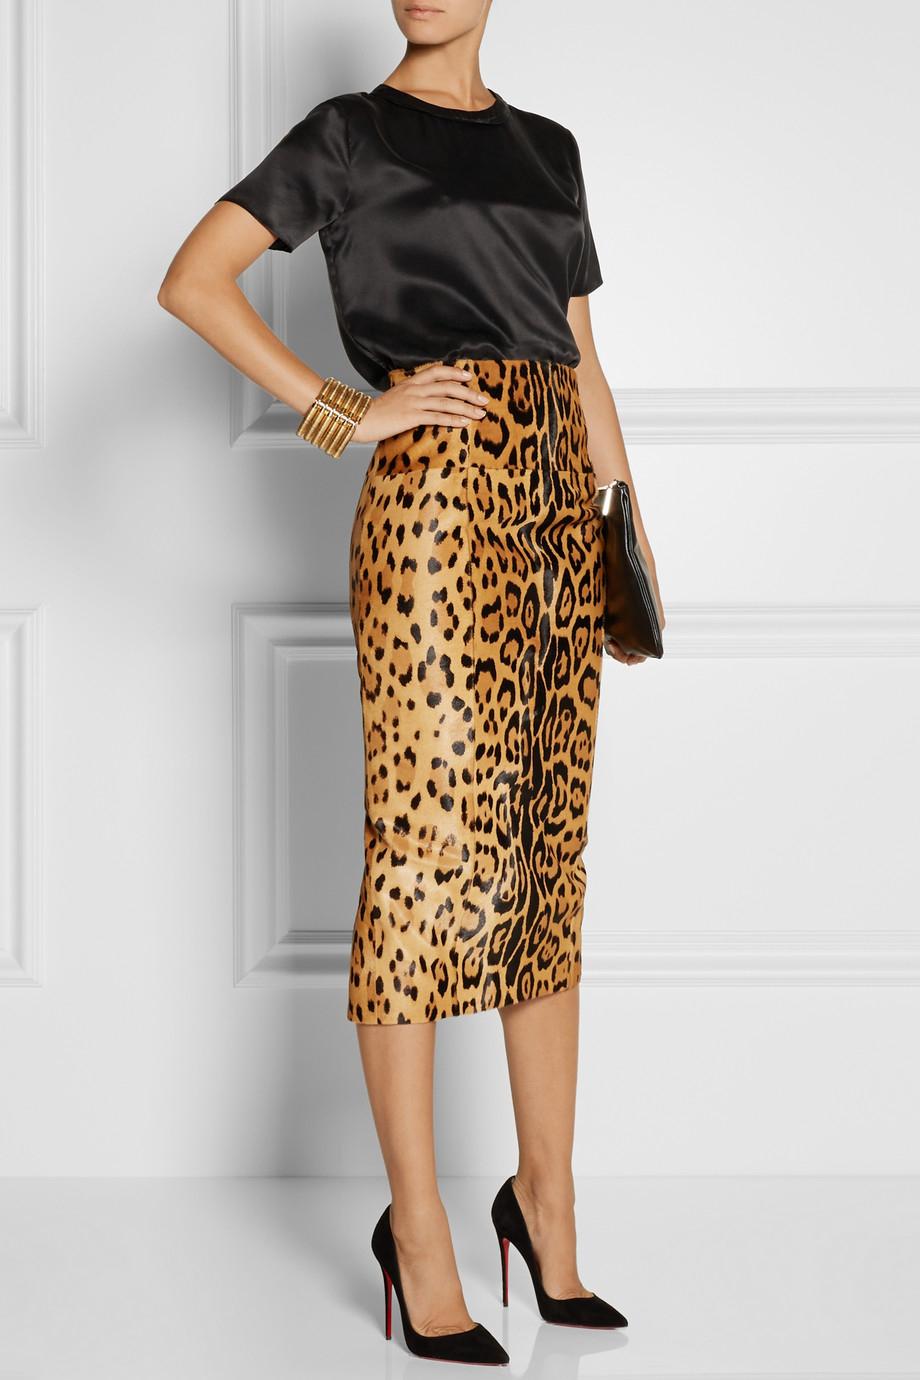 [Image: balmain-animal-leopard-print-calf-hair-m...ormal.jpeg]